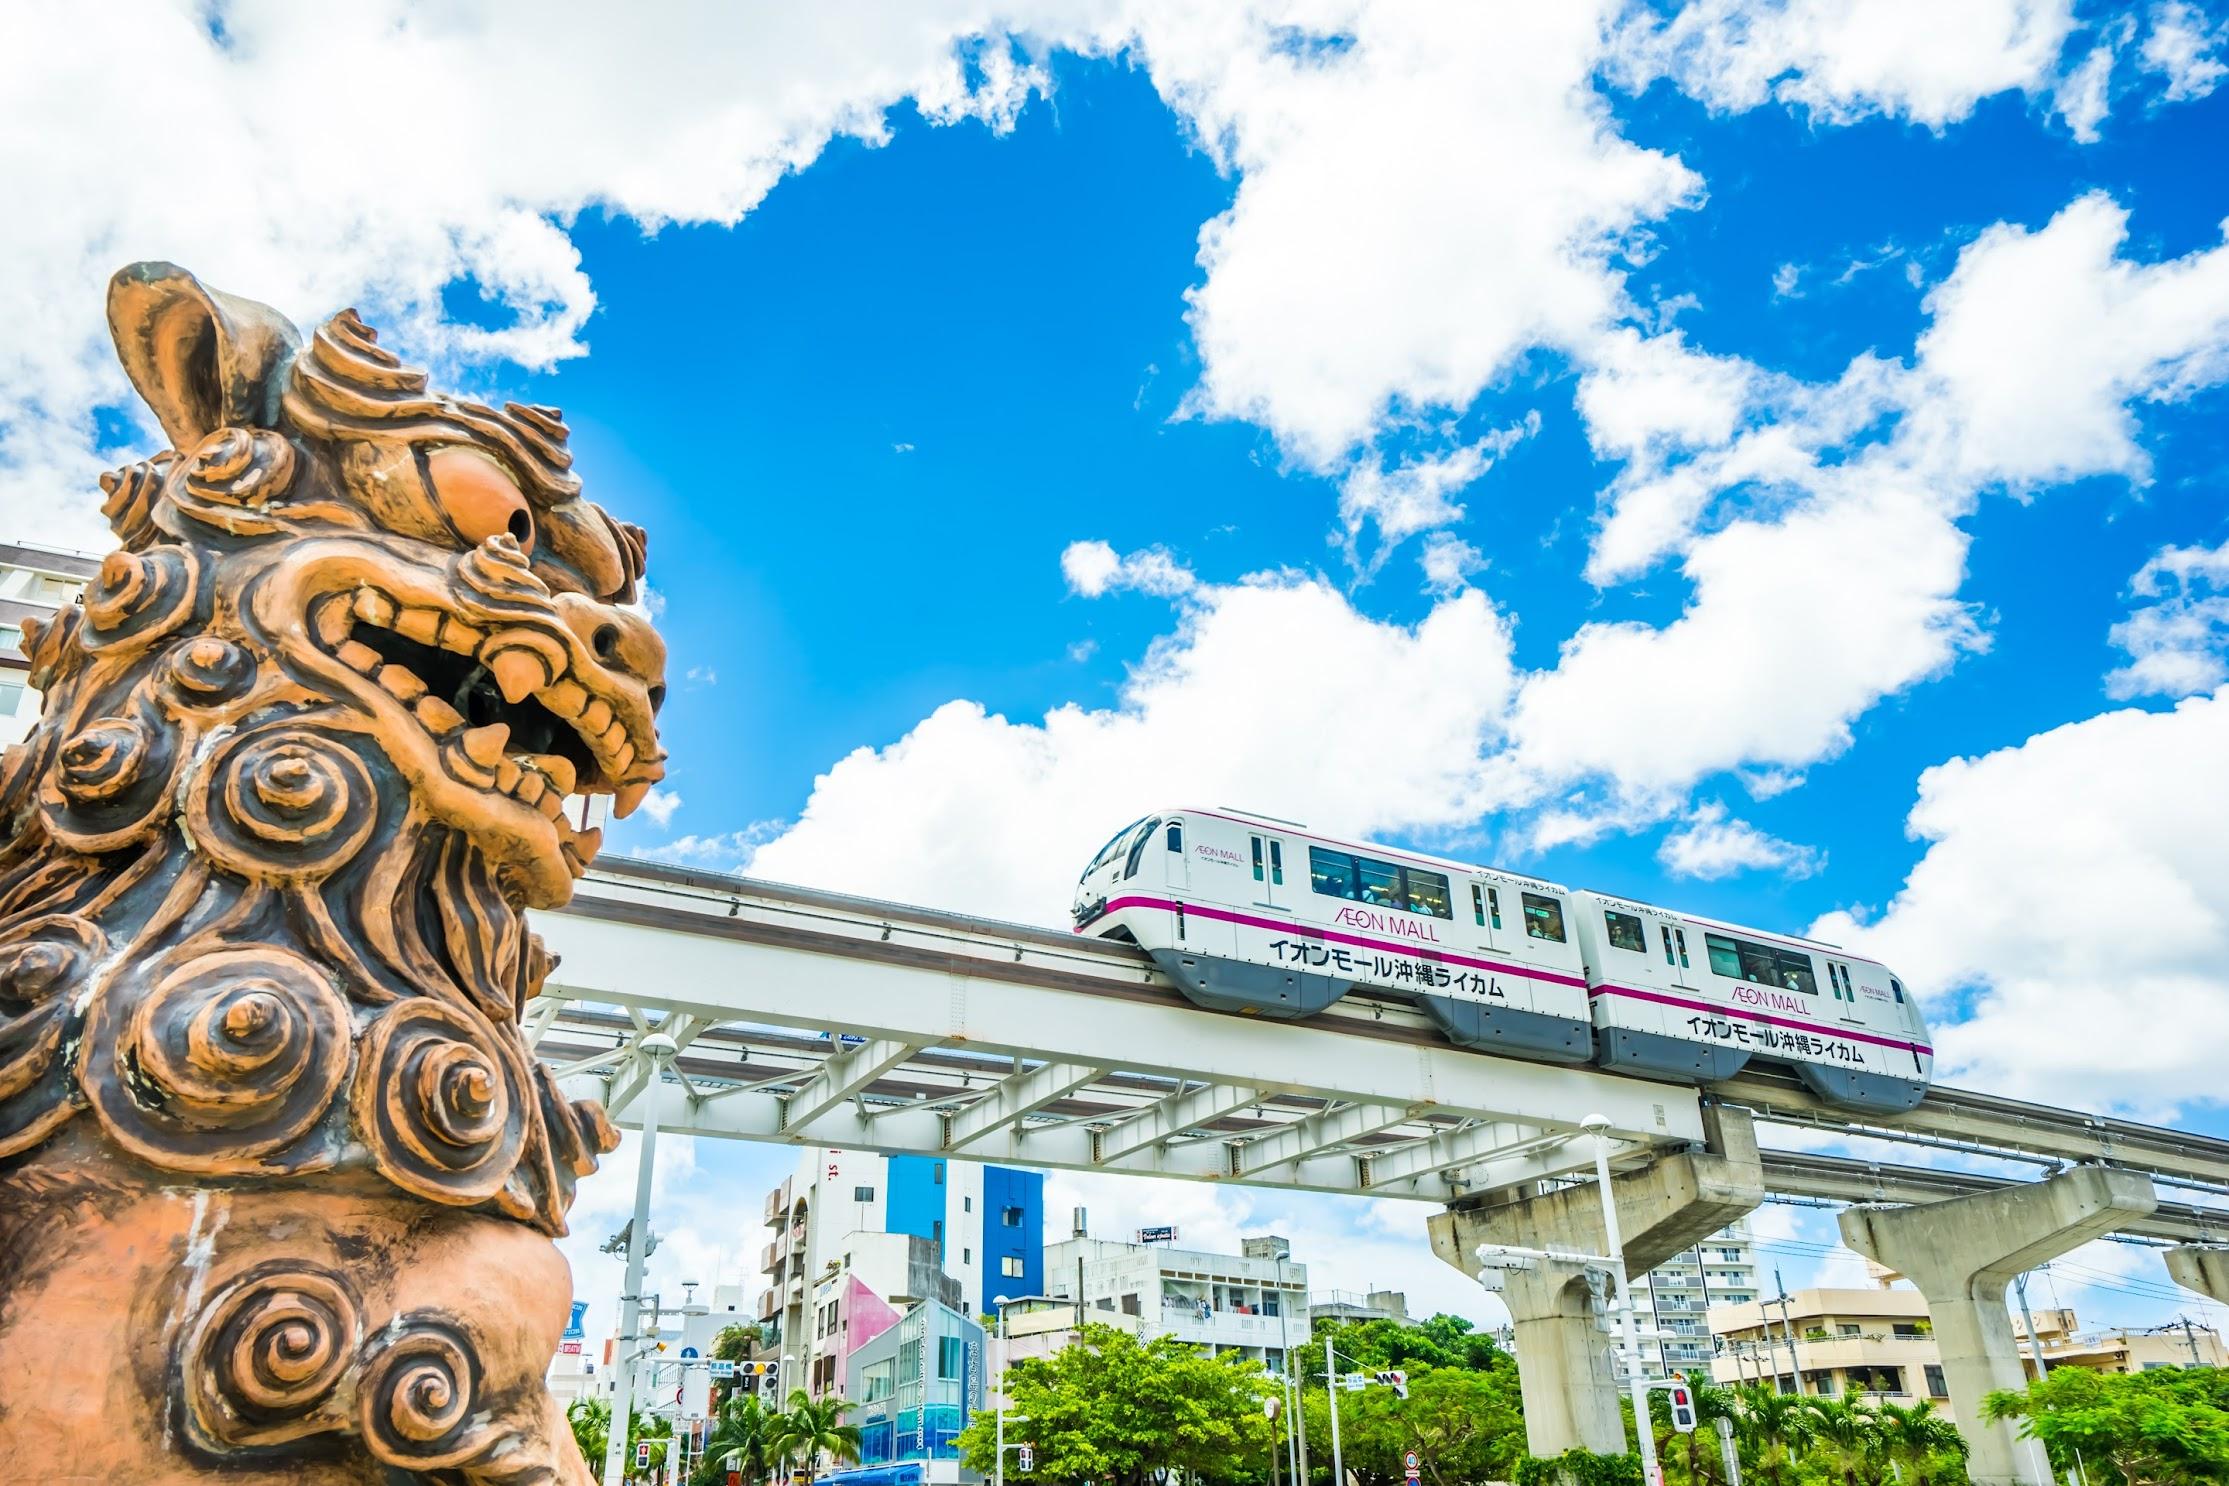 Okinawa Monorail2